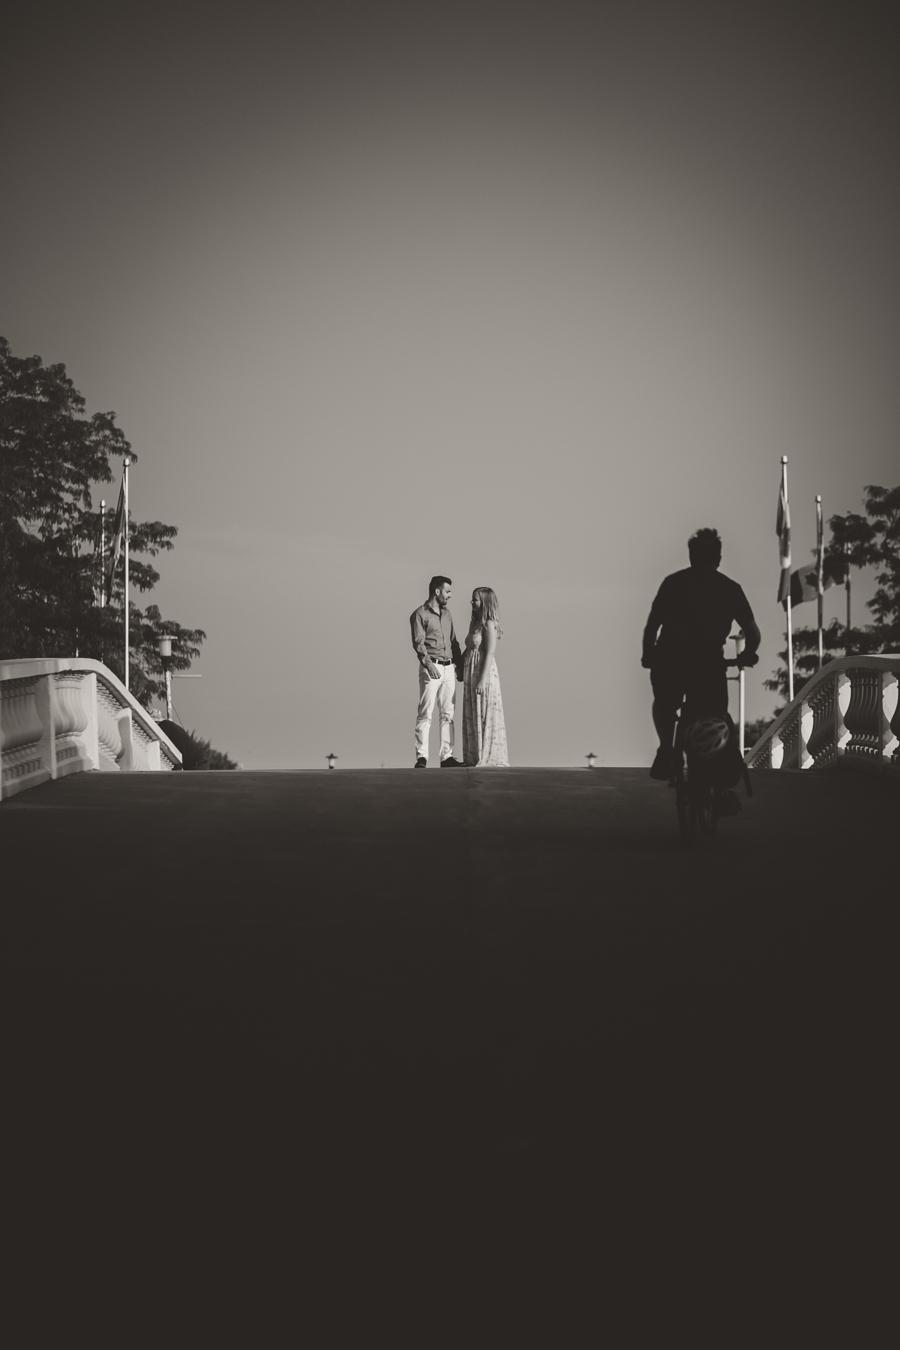 ontario wedding photographer, ontario engagement photographer, toronto island engagement photographer, peterborough ontario wedding photographer, peterborough ontario engagement photographer, niagra on the lake wedding photographer